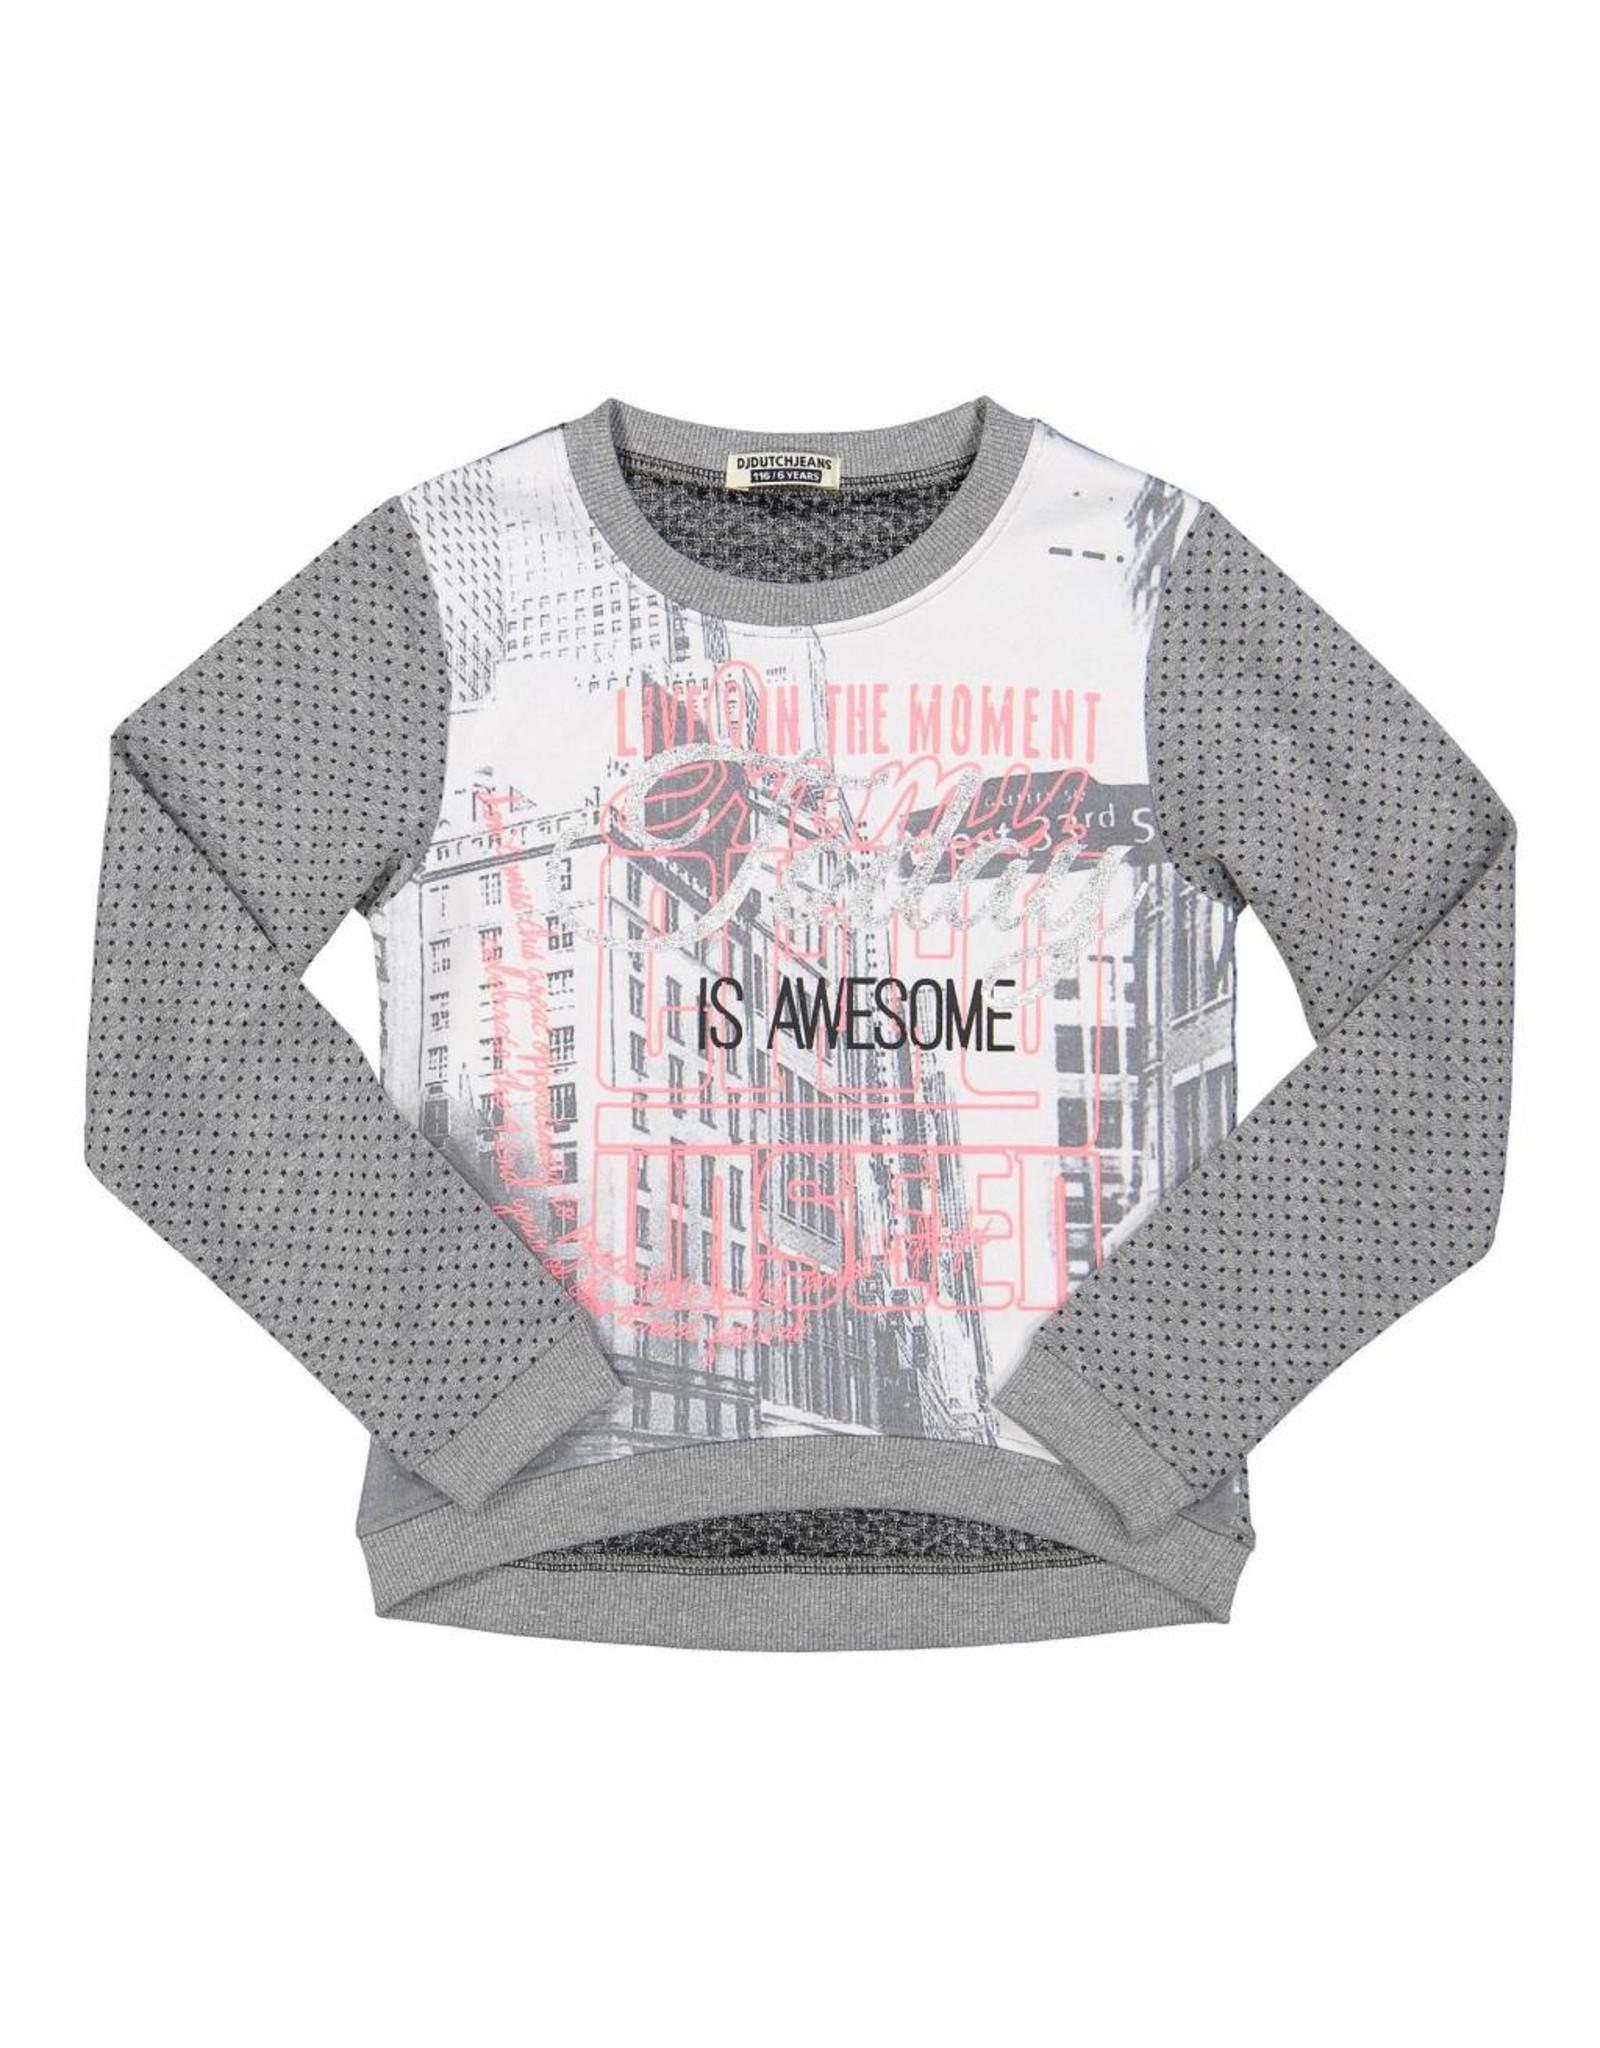 DJ Dutchjeans DJ Dutchjeans meiden sweater So Awesome